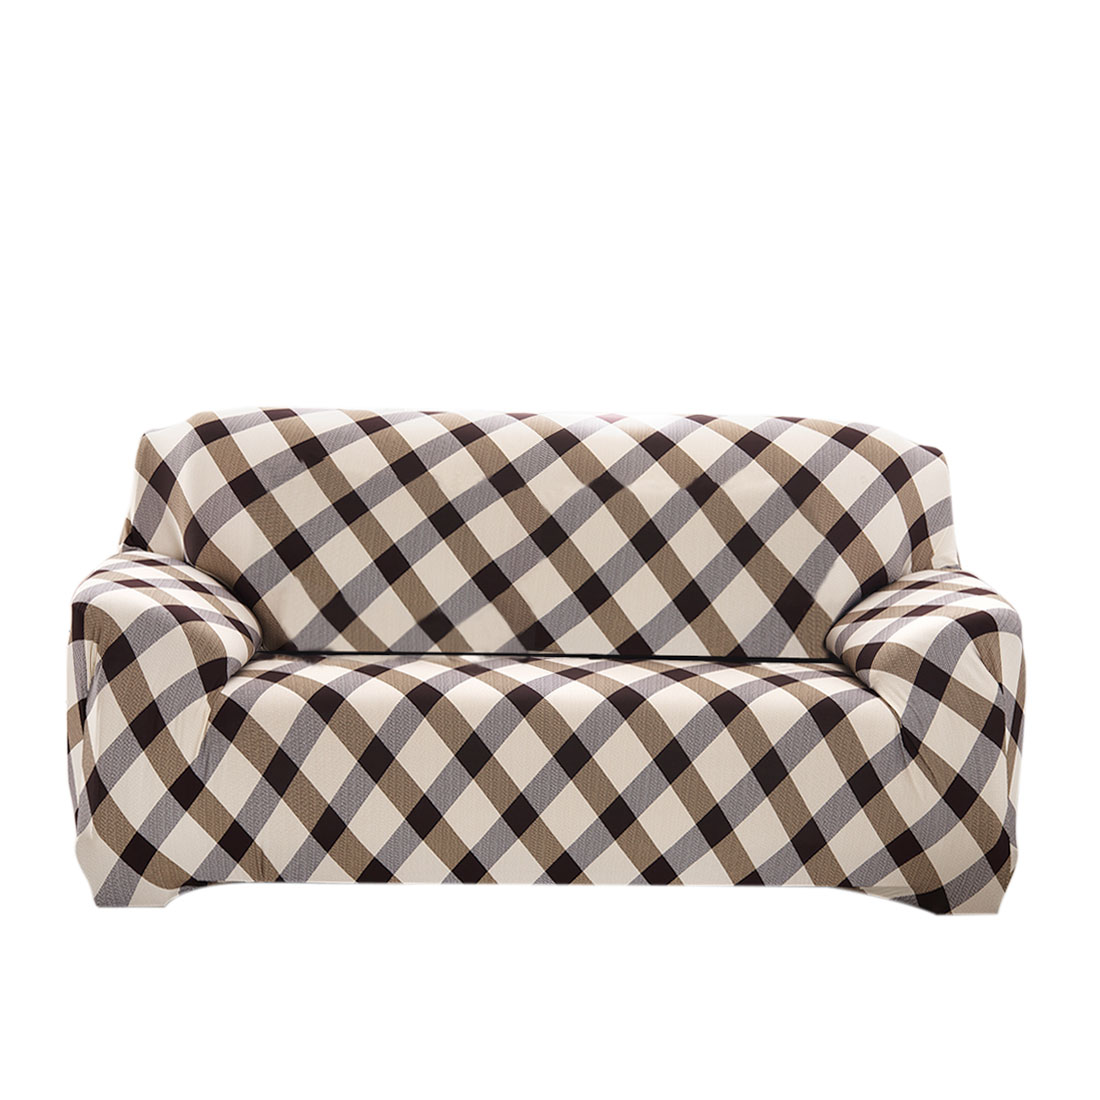 Home Polyester Grid Pattern Sofa Loveseat Cover Slipcover